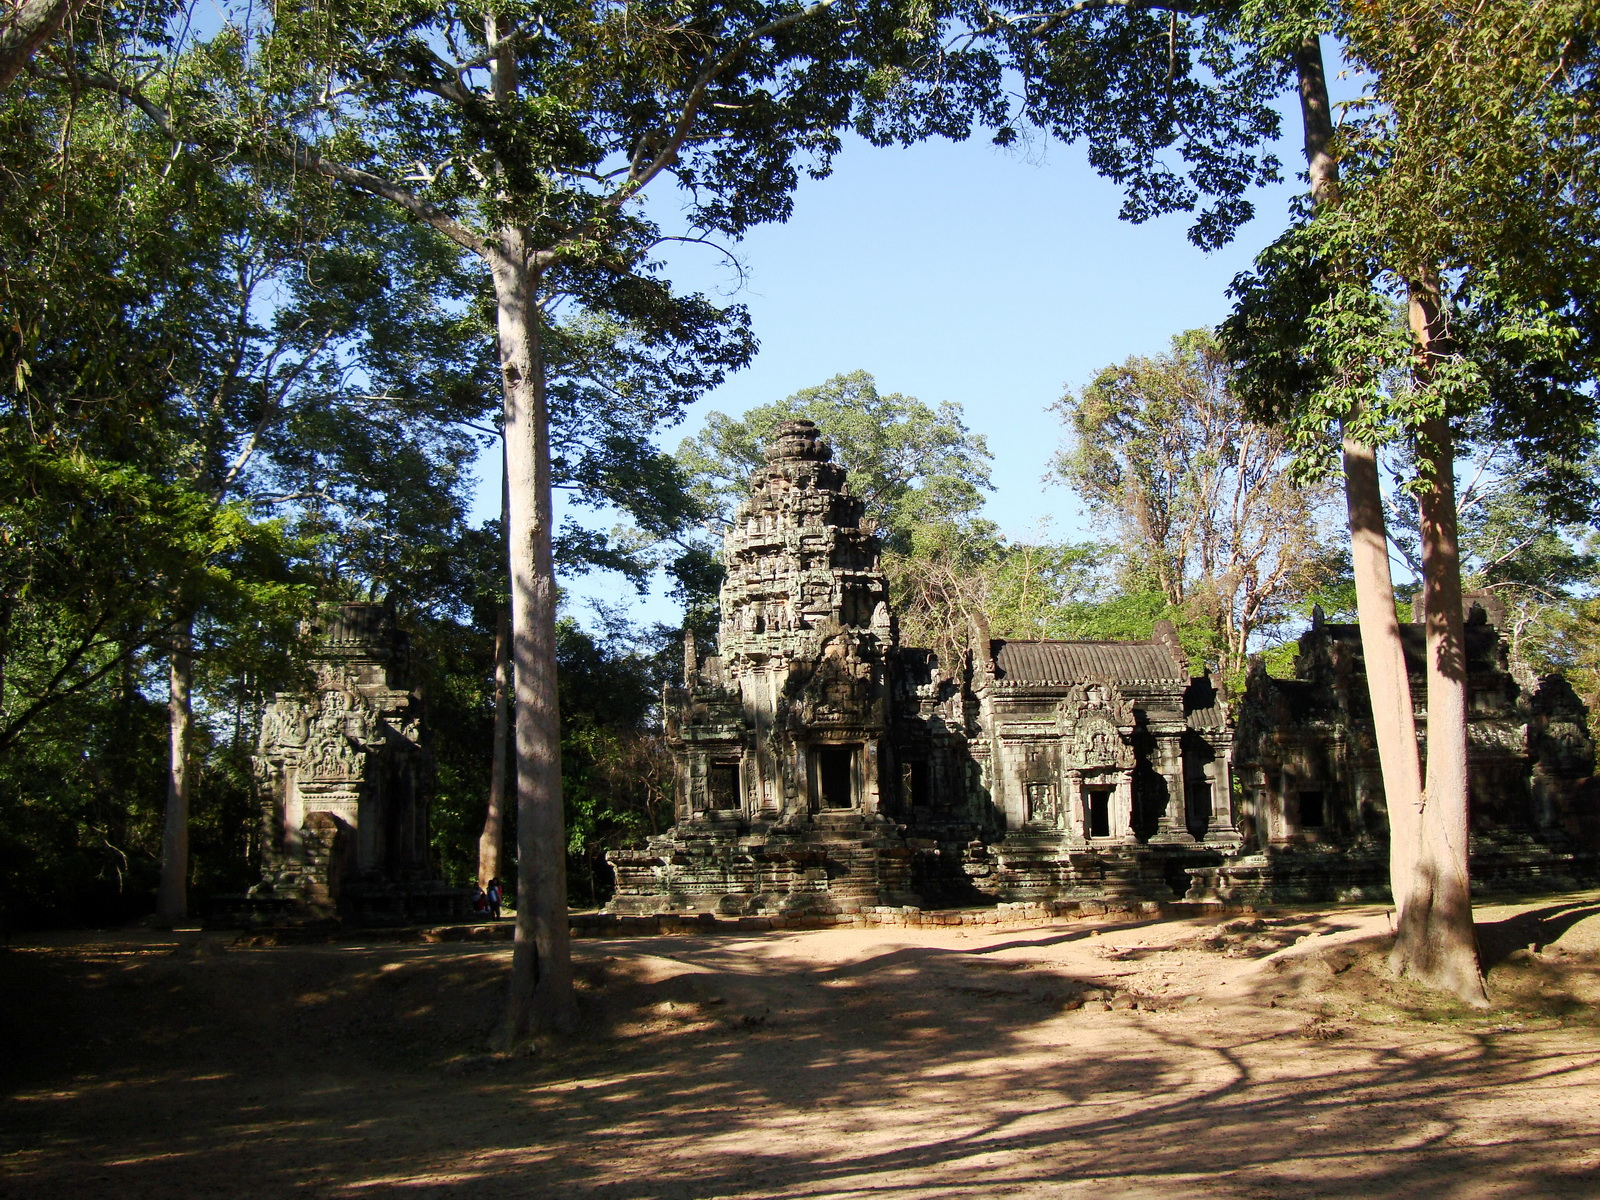 Tamanon Temple Angkor Siem Reap Cambodia Jan 2010 02